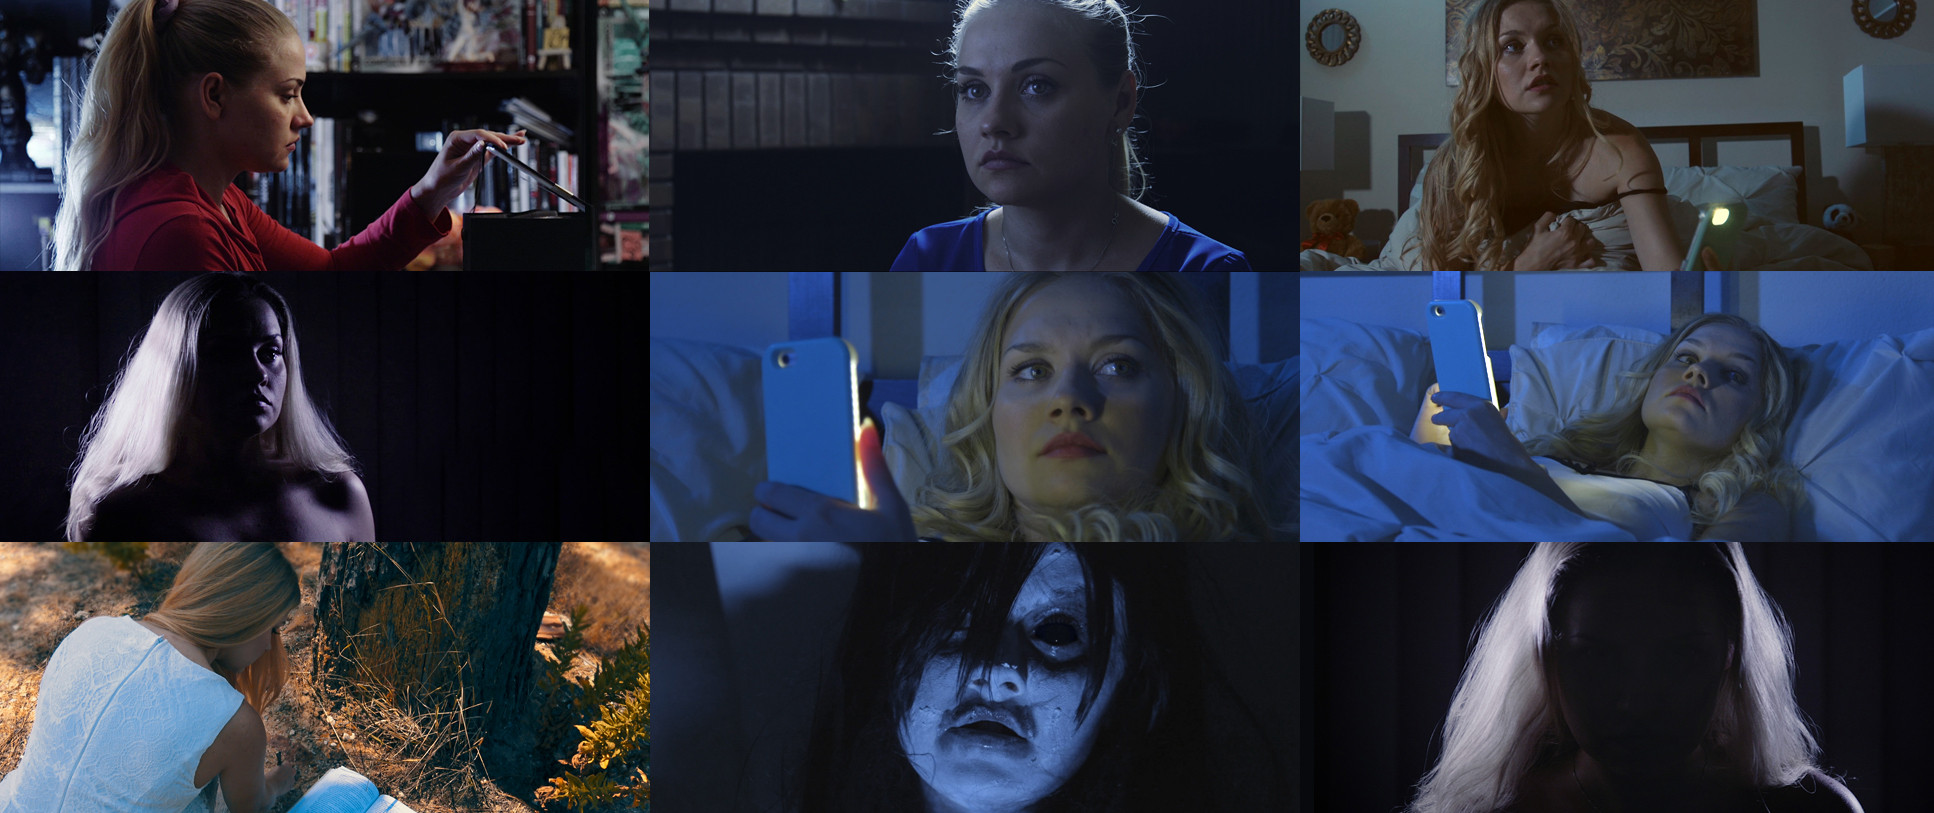 Cinematography tests/studies